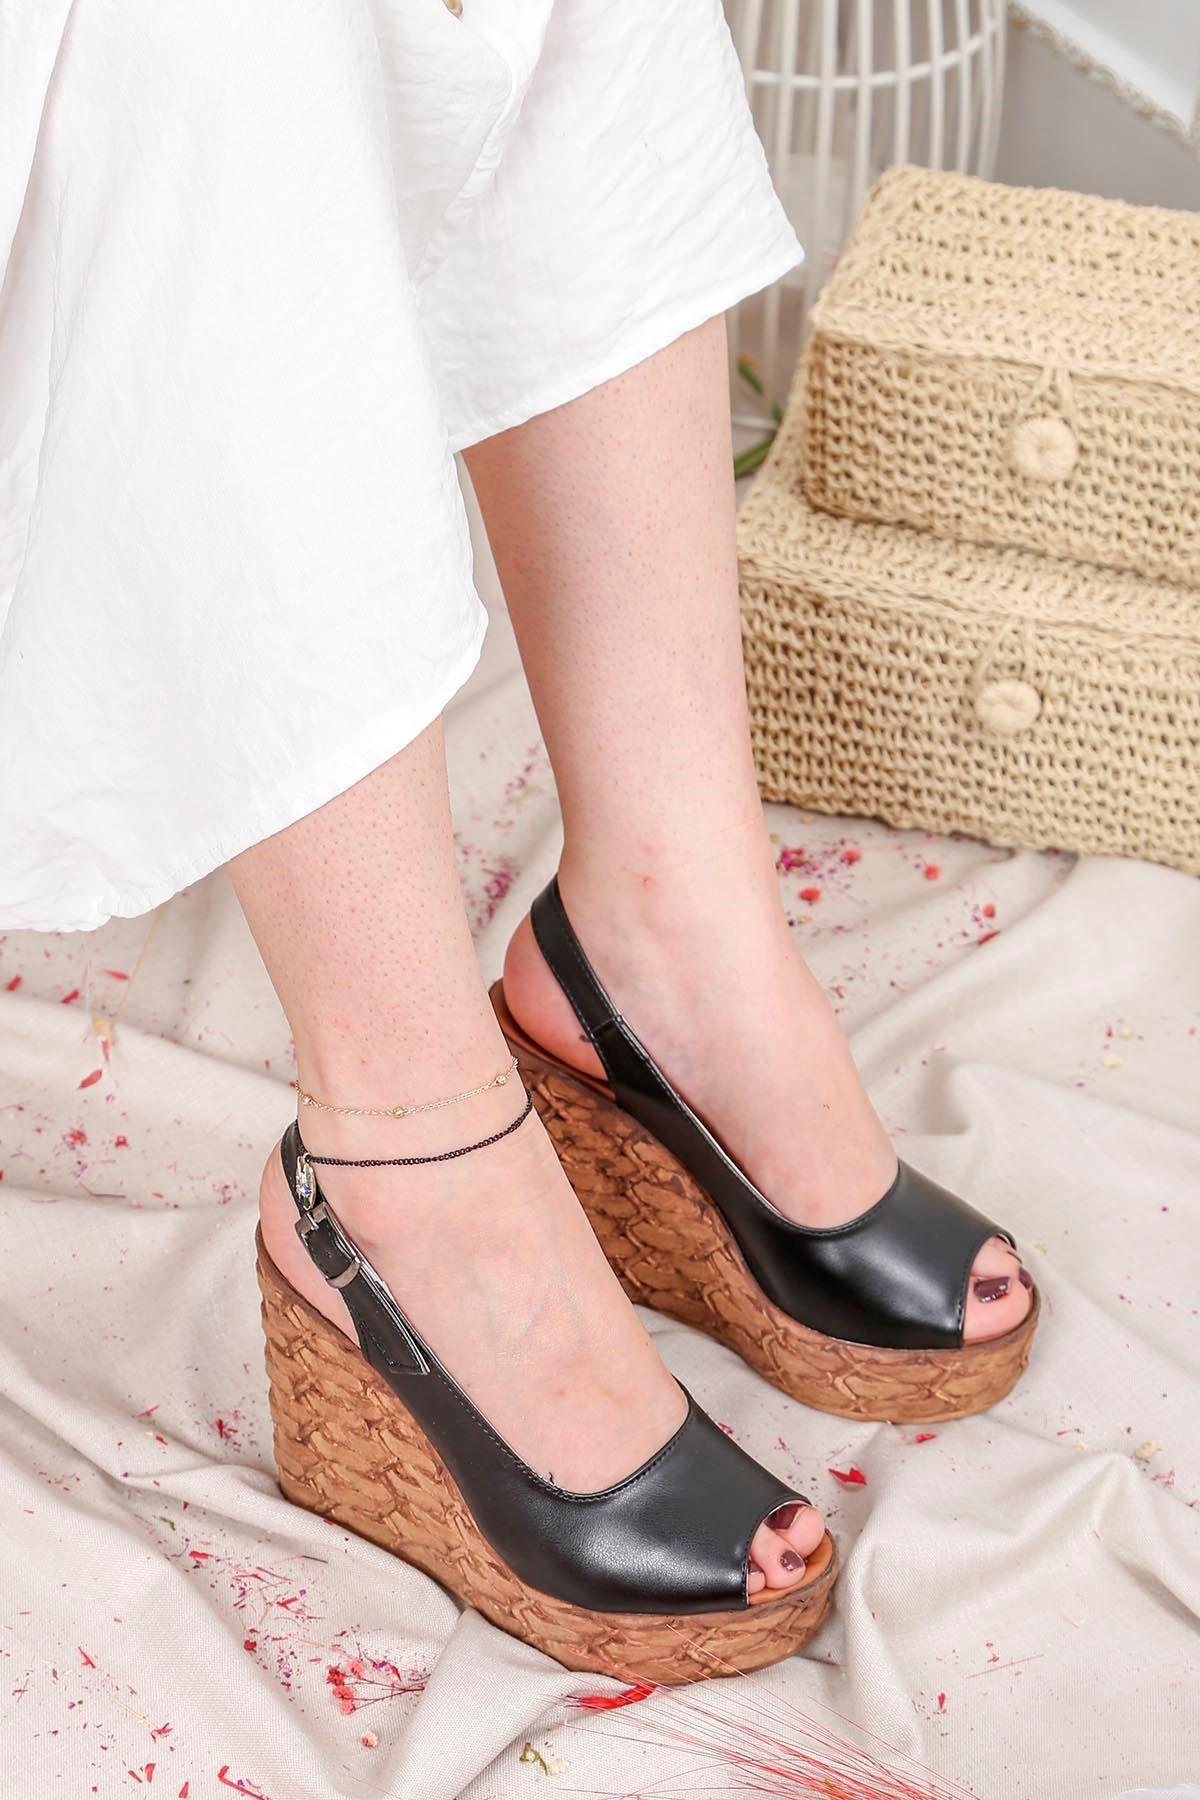 Frm-002 Yüksek Taban Sandalet Siyah Deri